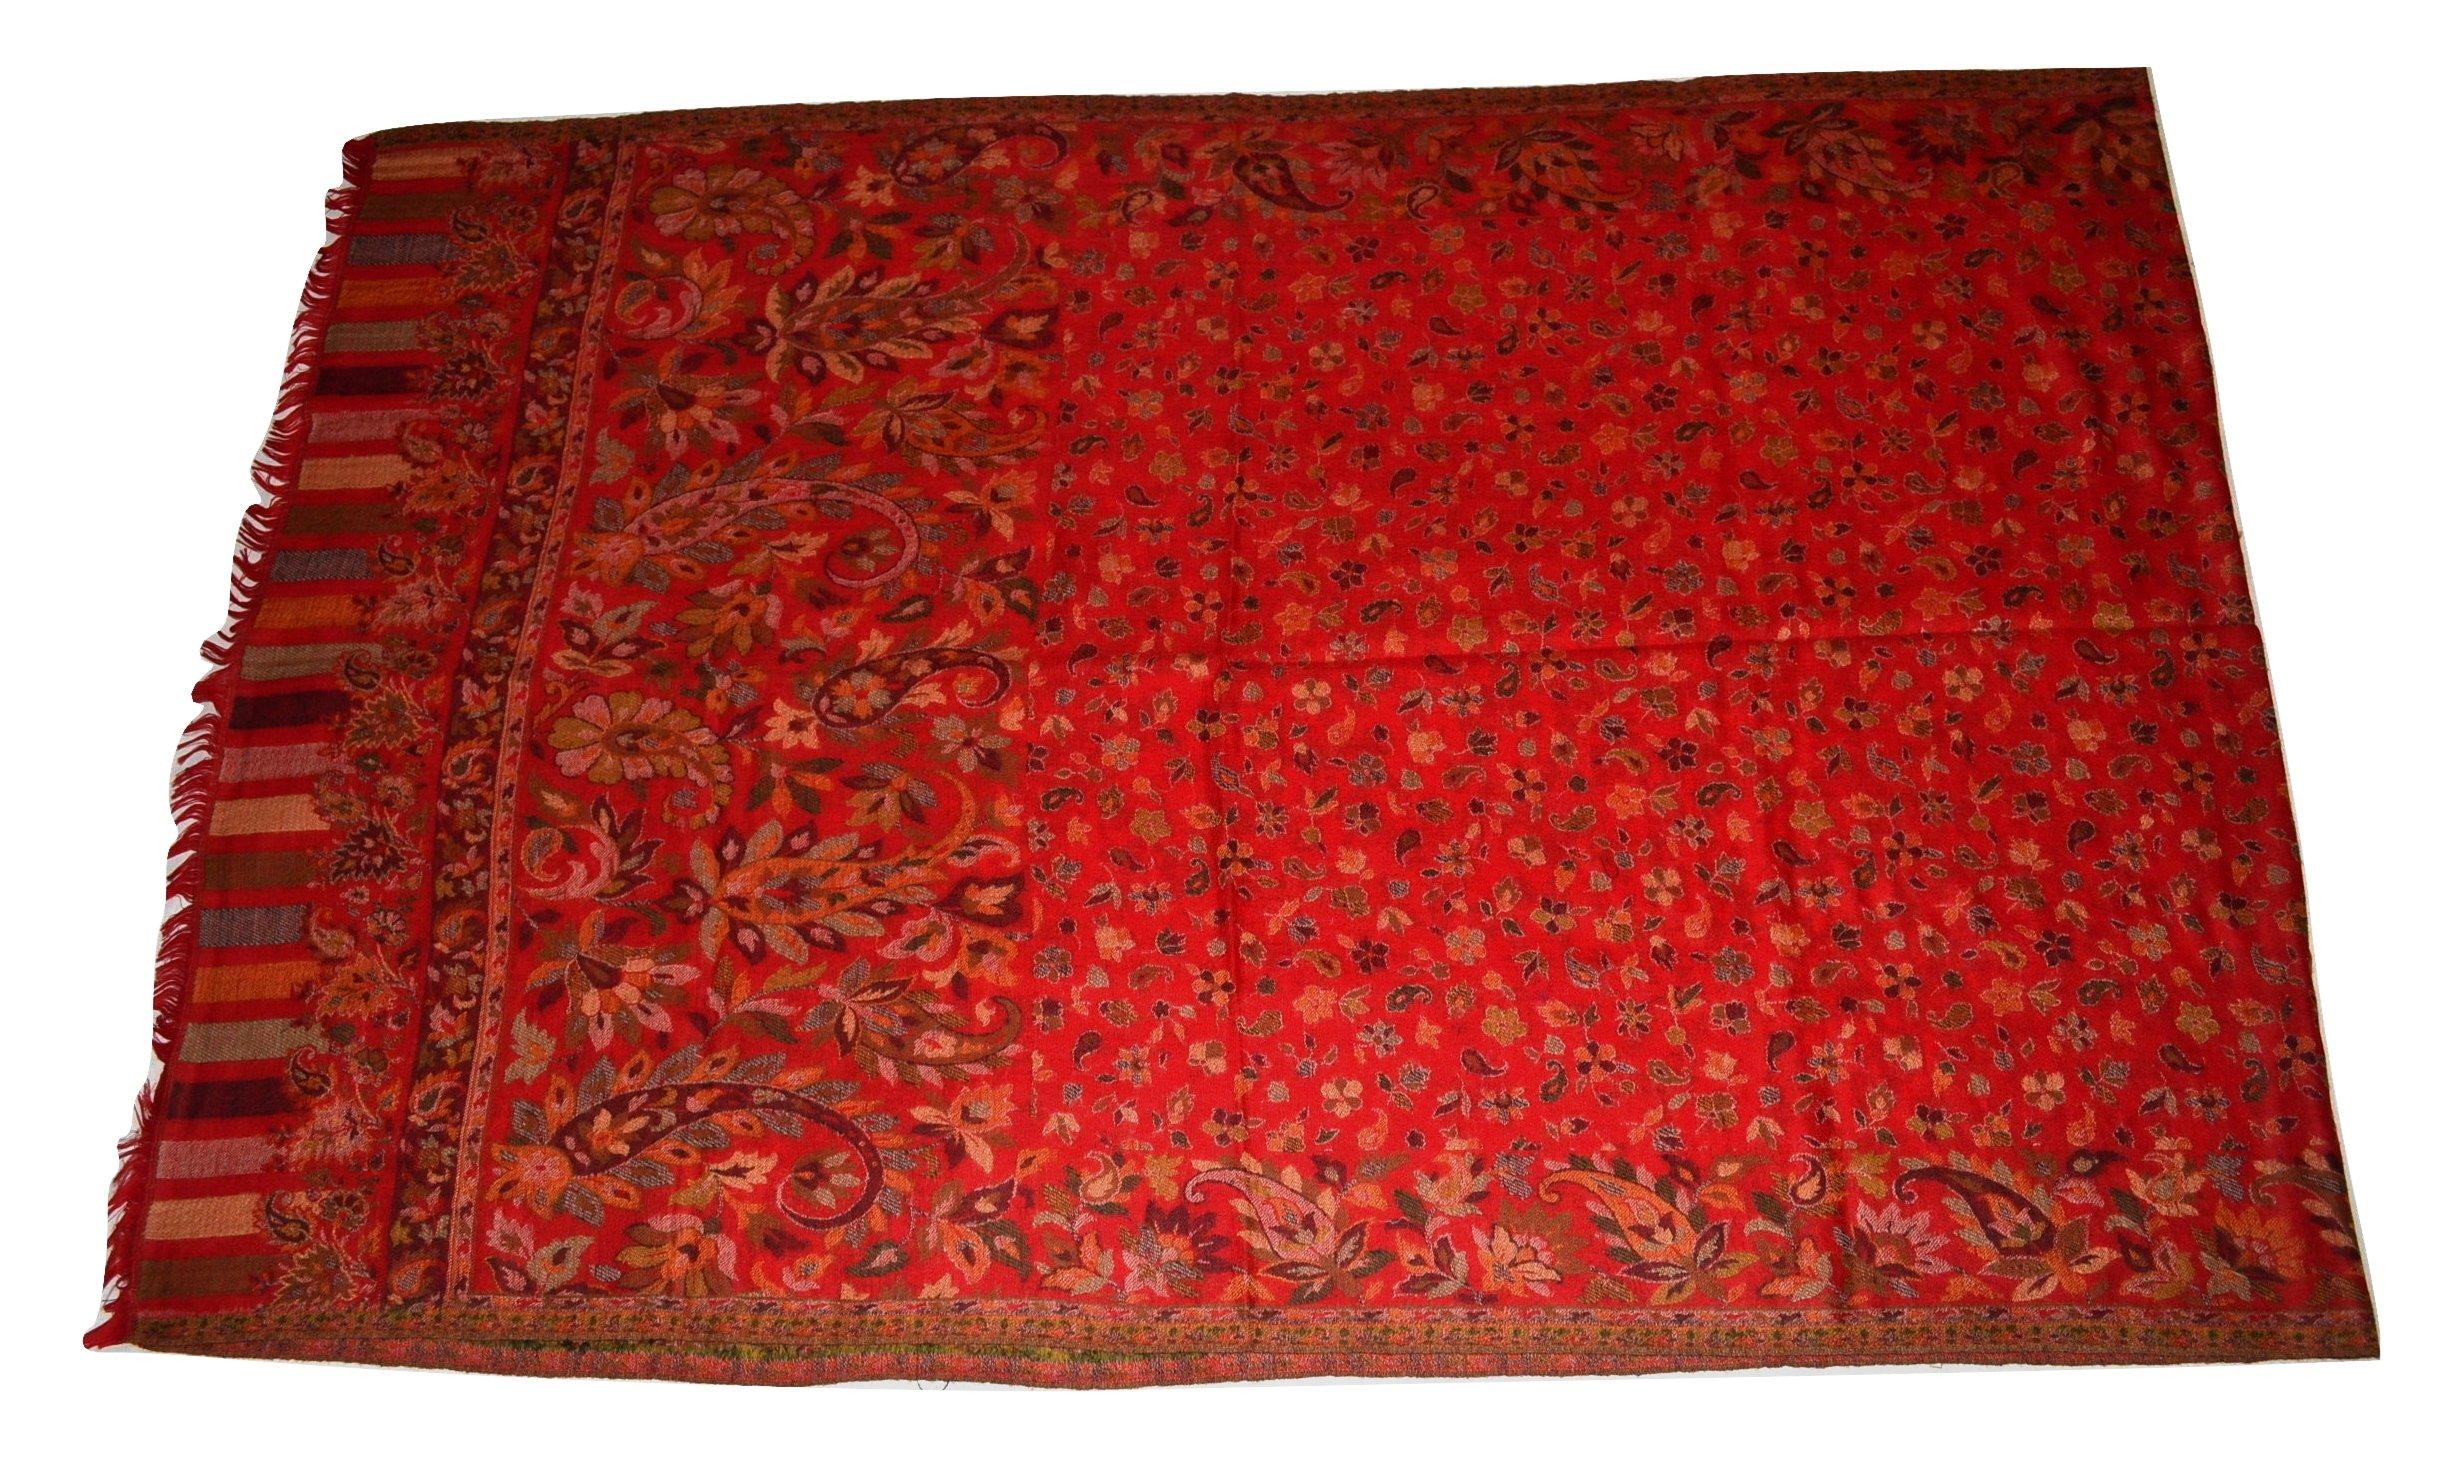 Handmade Pashmina & Fine Wool Fabric Multicolor Floral Paisley KANI Scarf/Stole.X1835